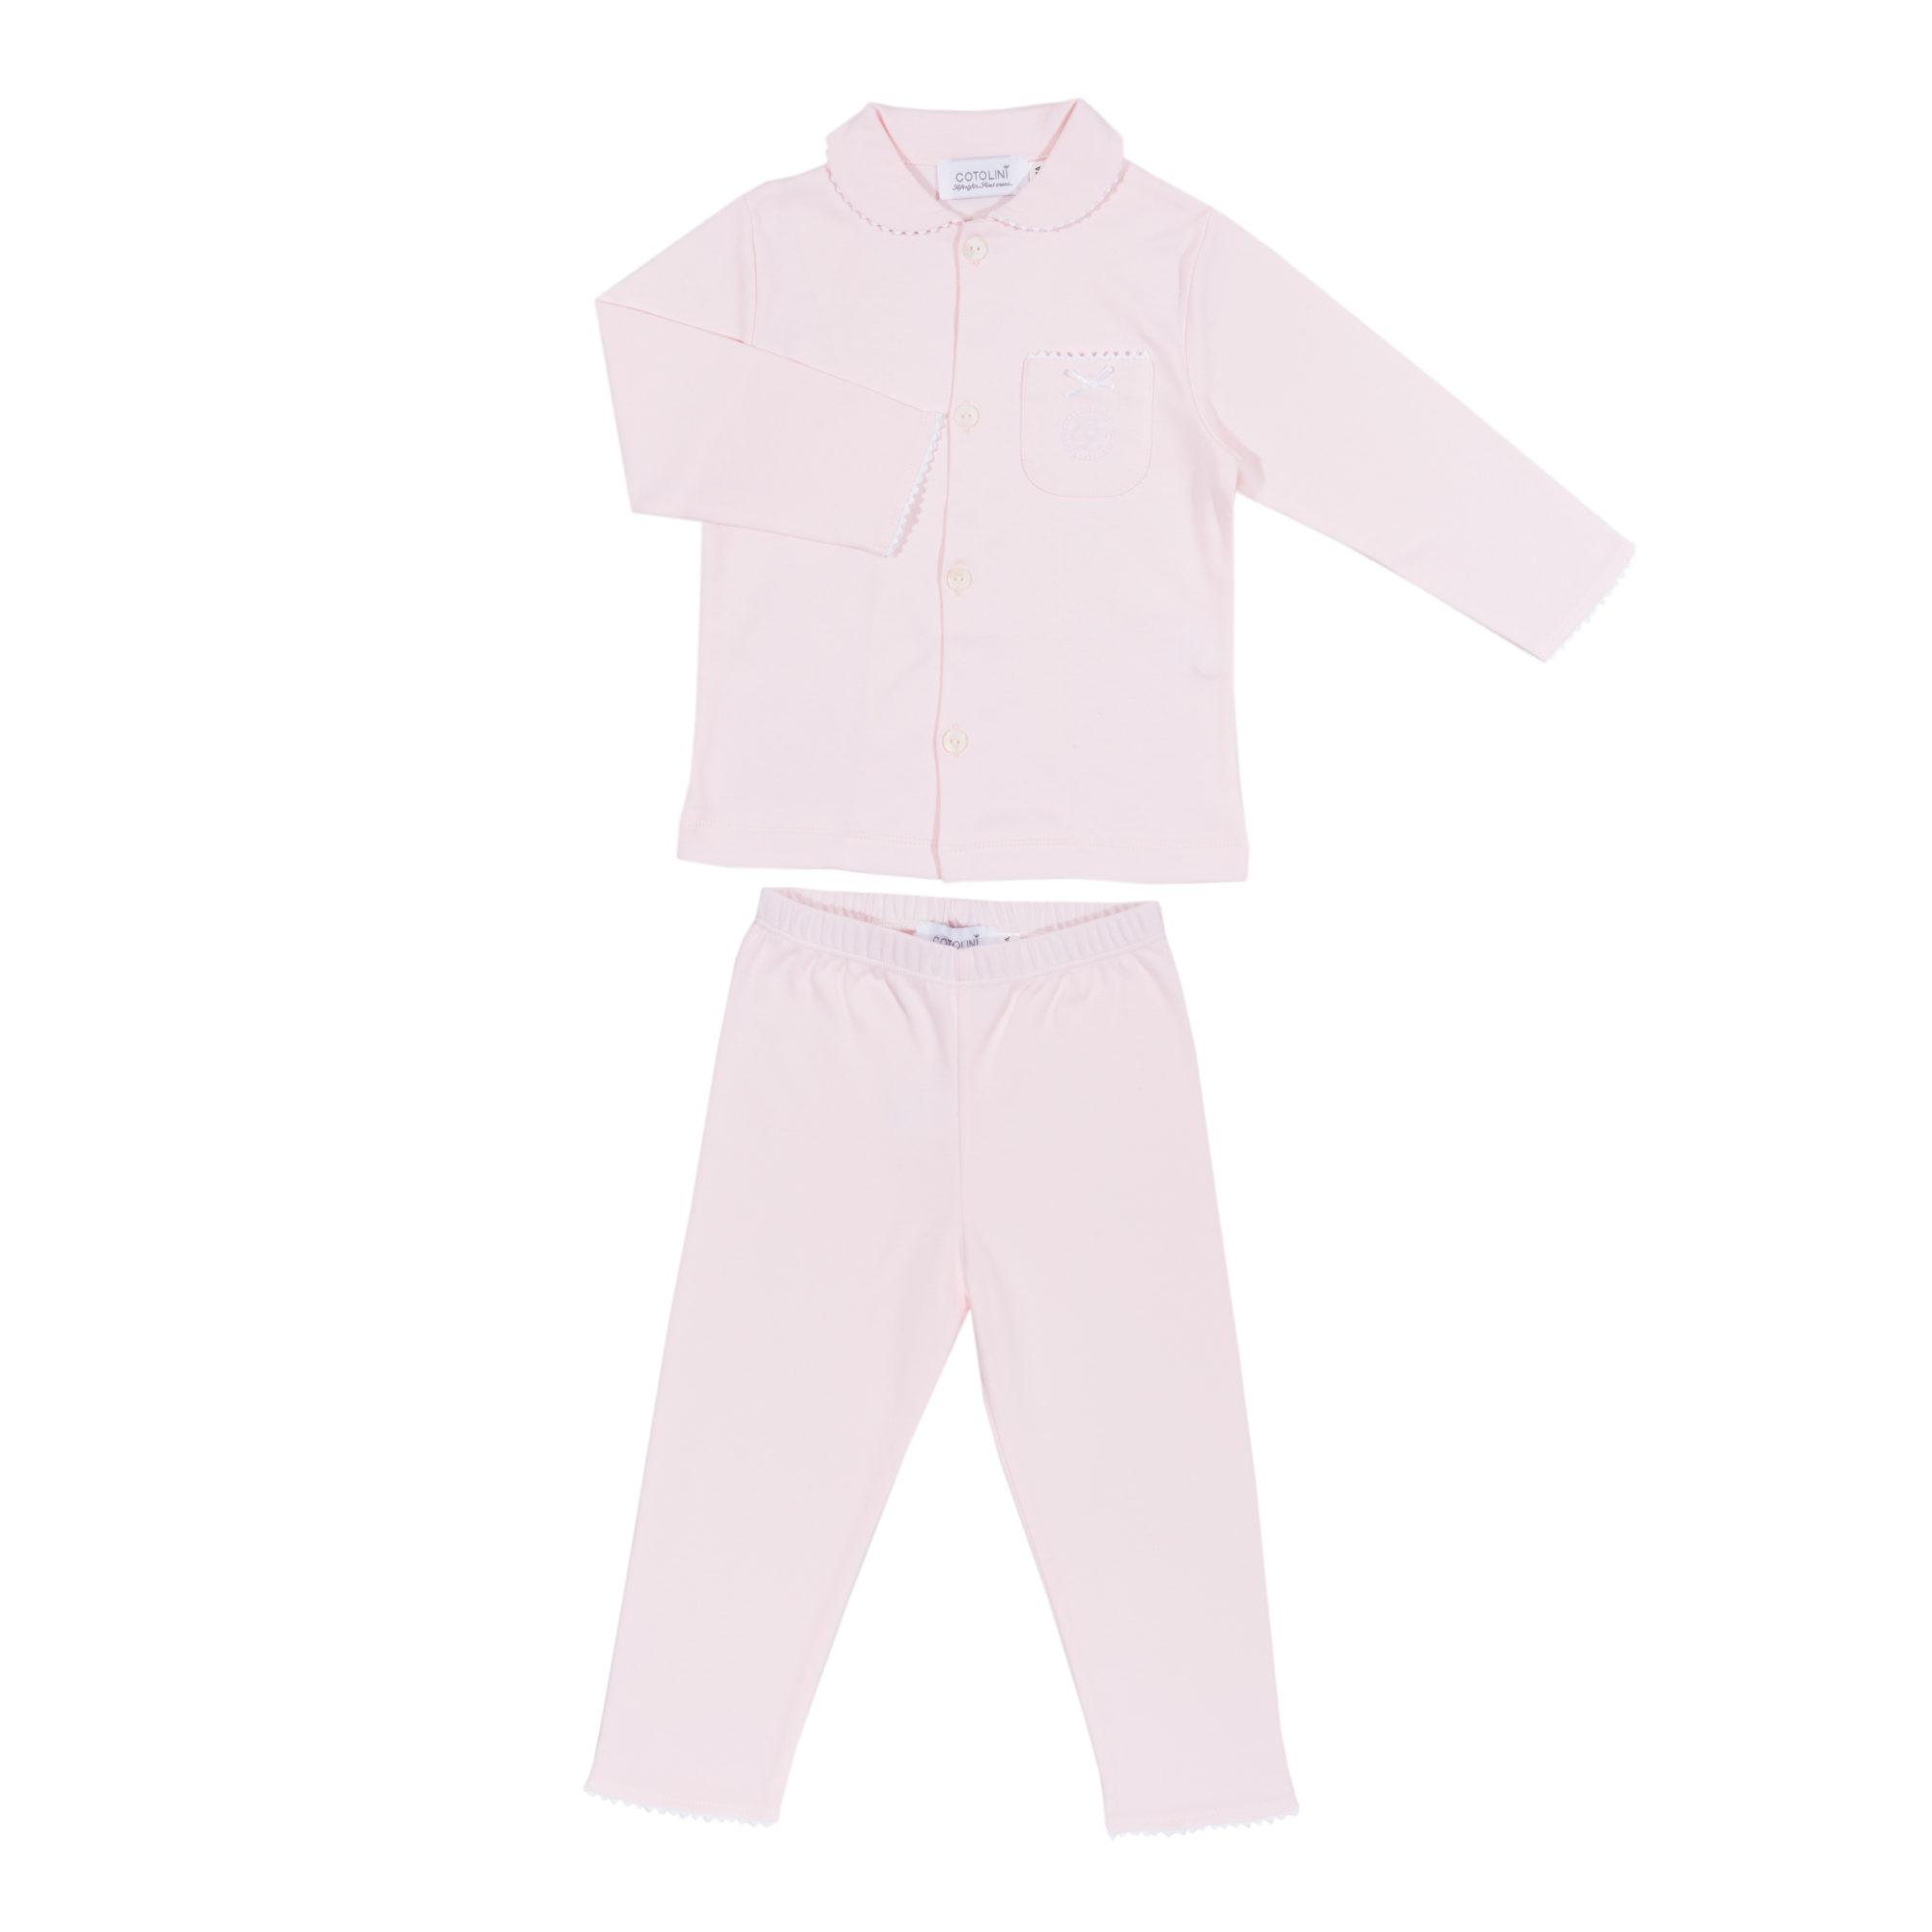 Cotolini Pyjama LM, Doorknoop